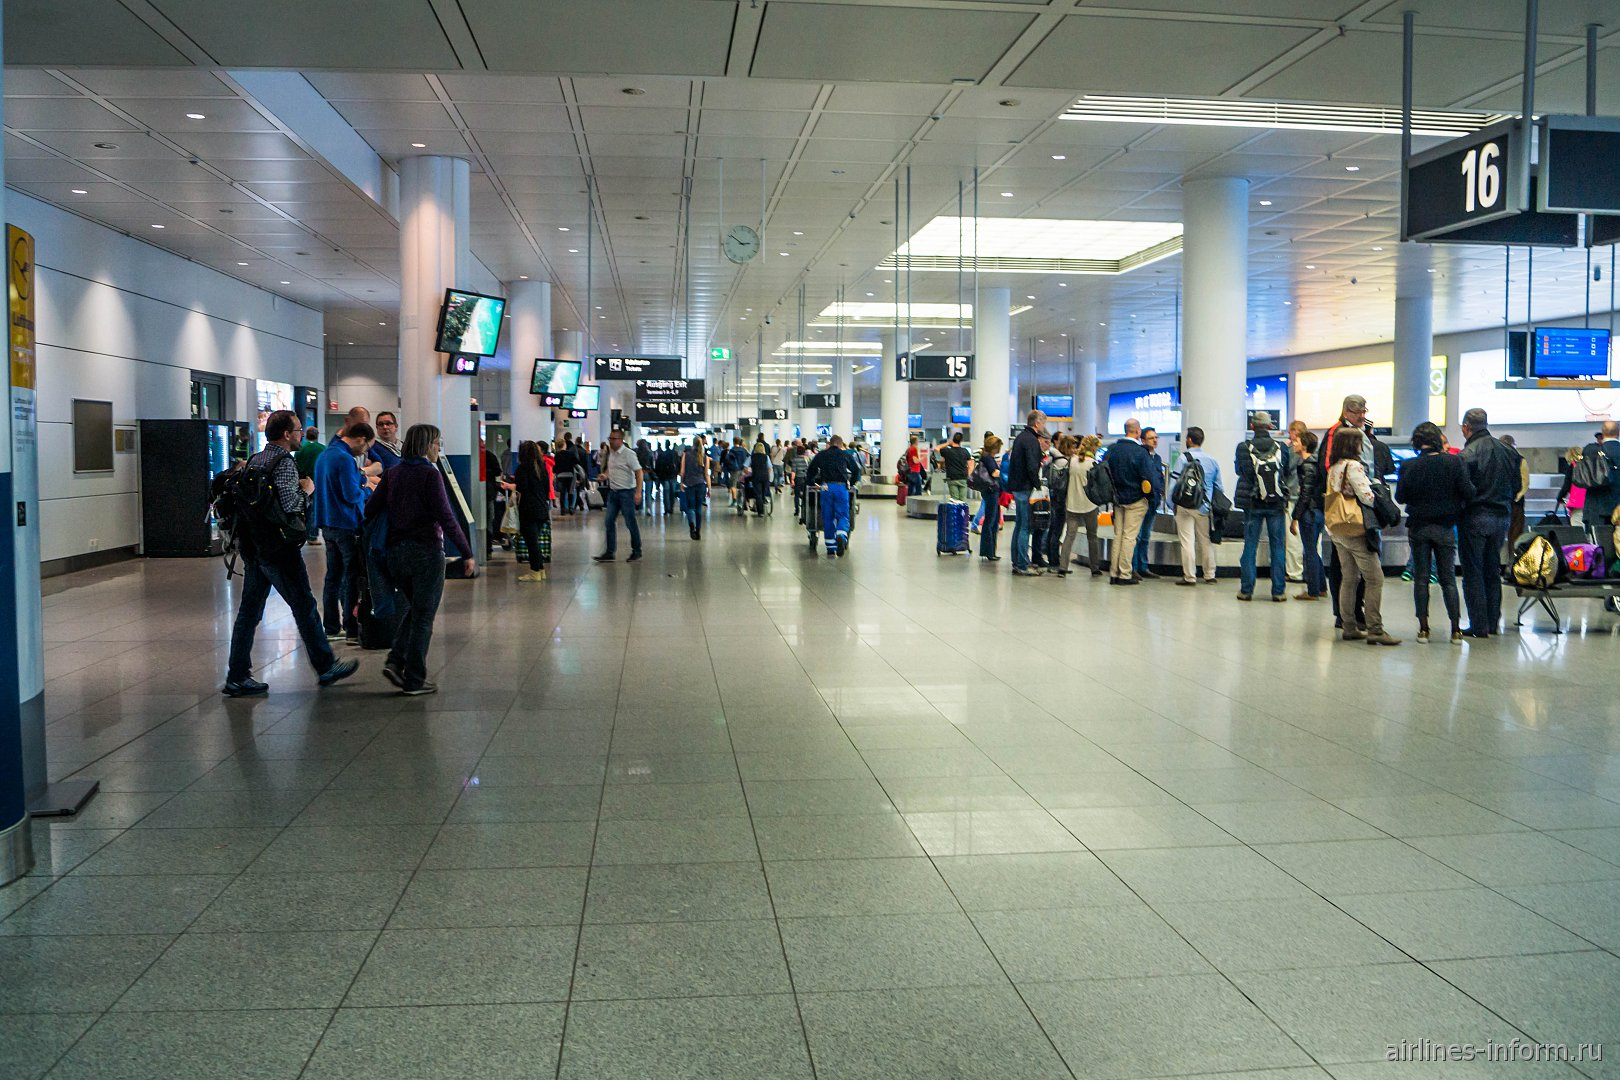 Общий вид зала выдачи багажа терминала 2 аэропорта Мюнхен